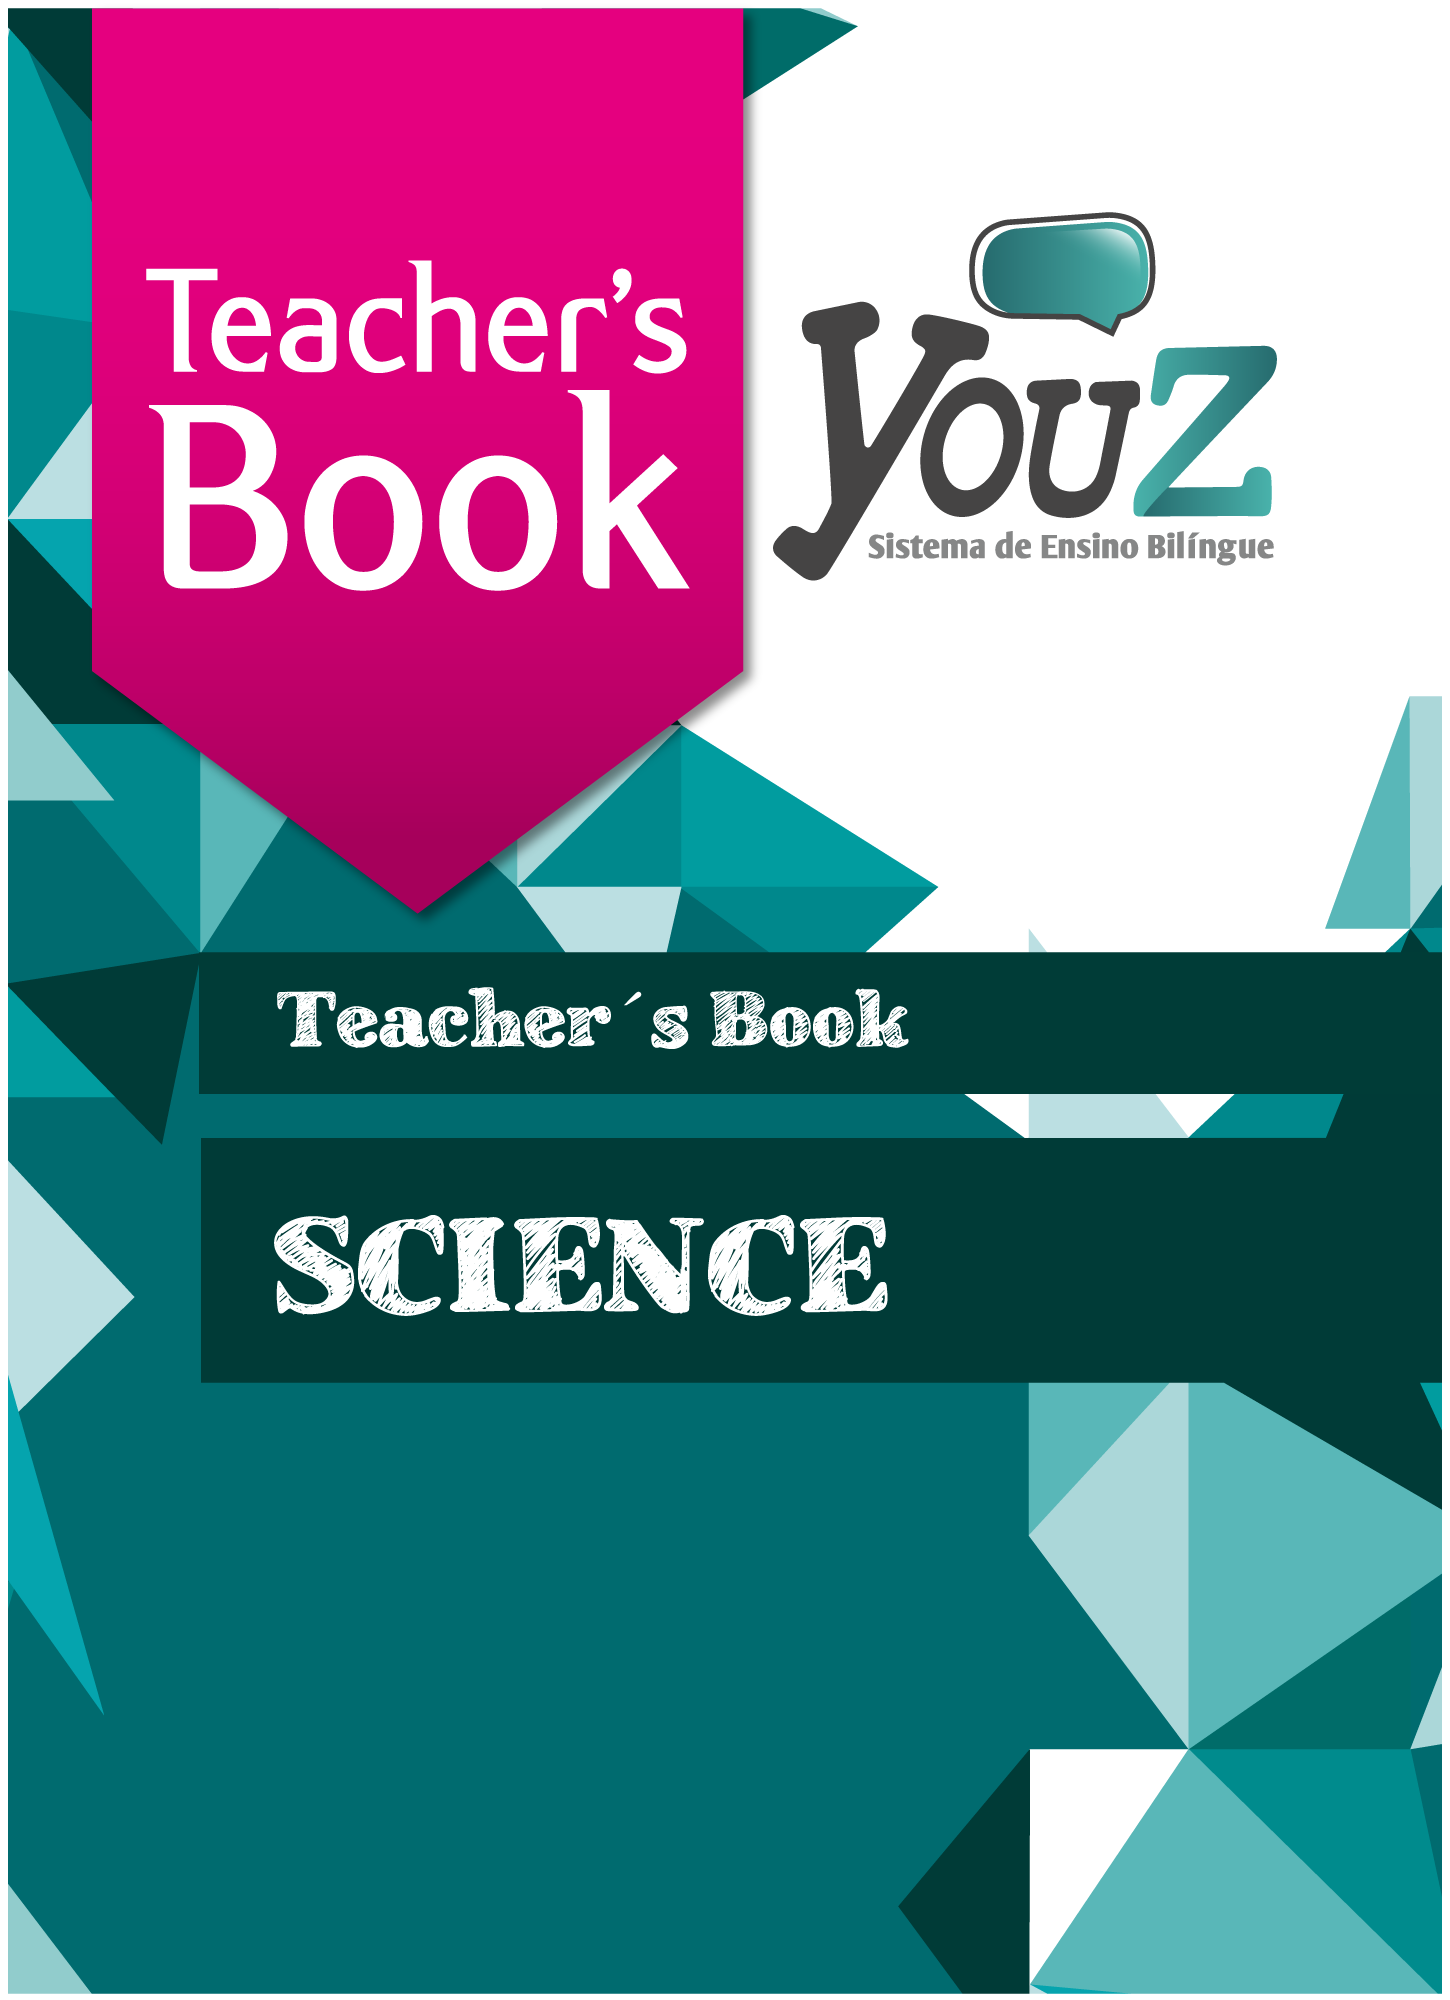 Teacher's Book Science Fund I